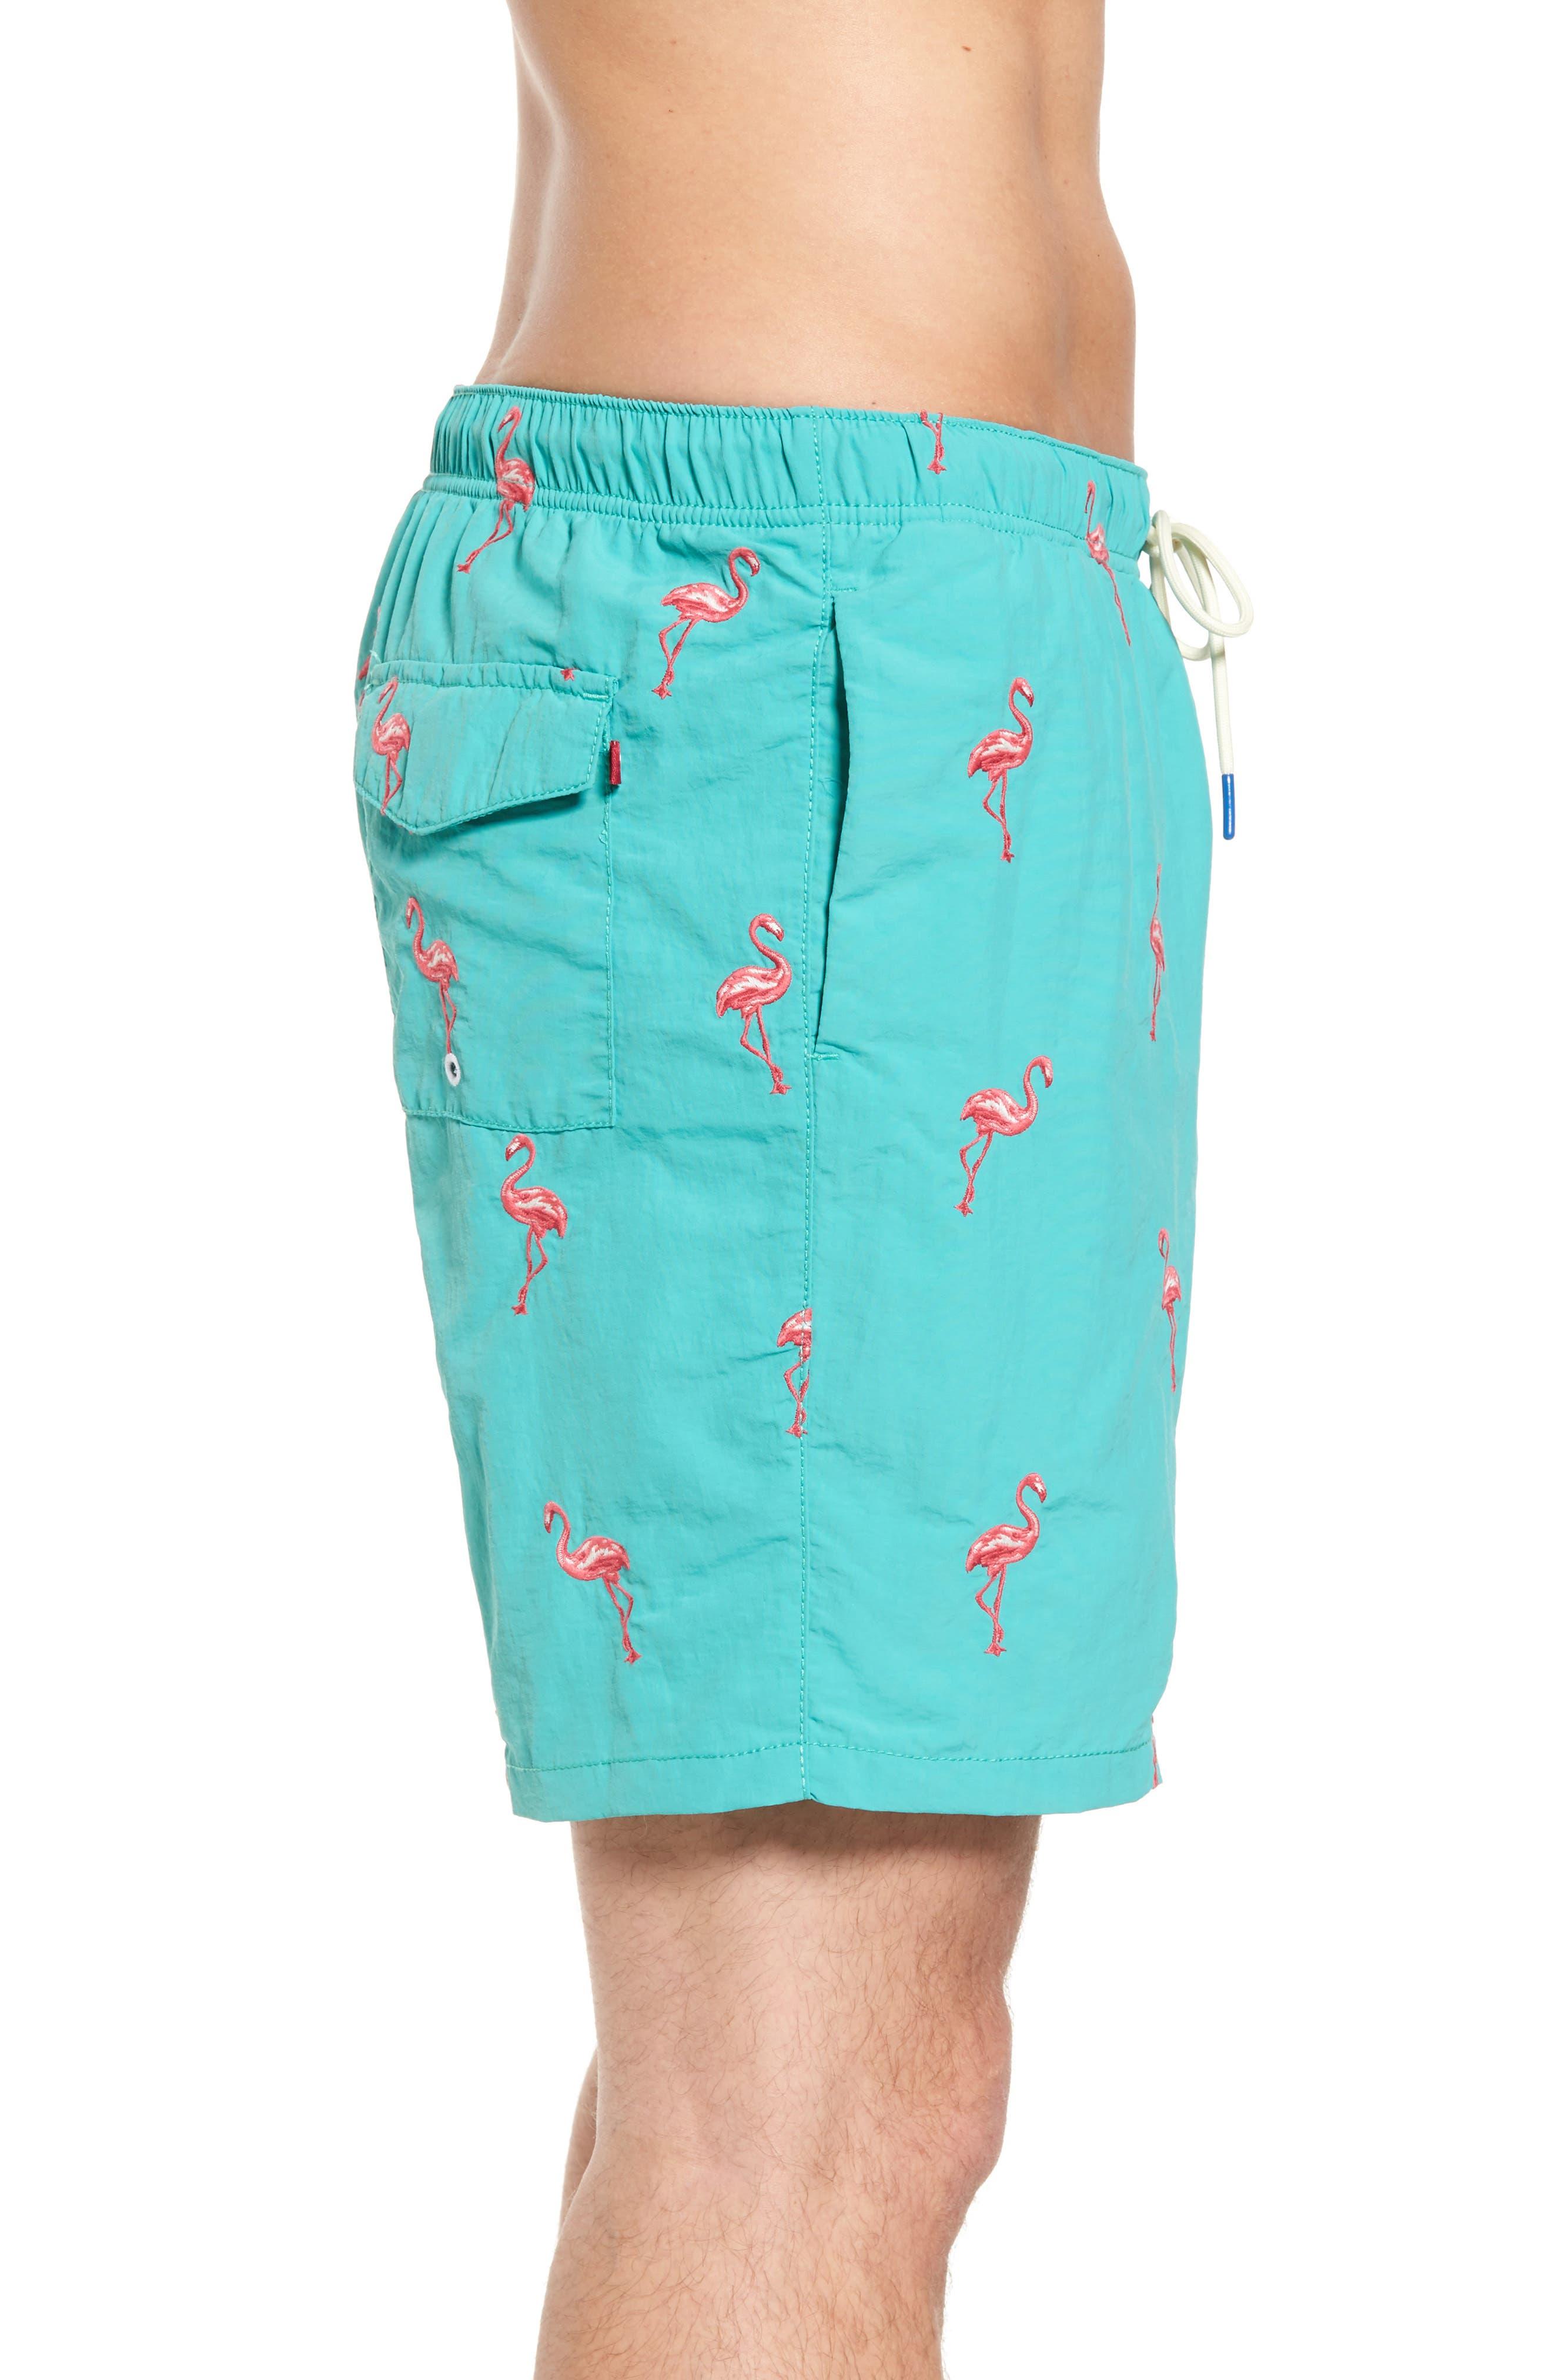 Naples Flamingo Coast Swim Trunks,                             Alternate thumbnail 3, color,                             Castaway Green